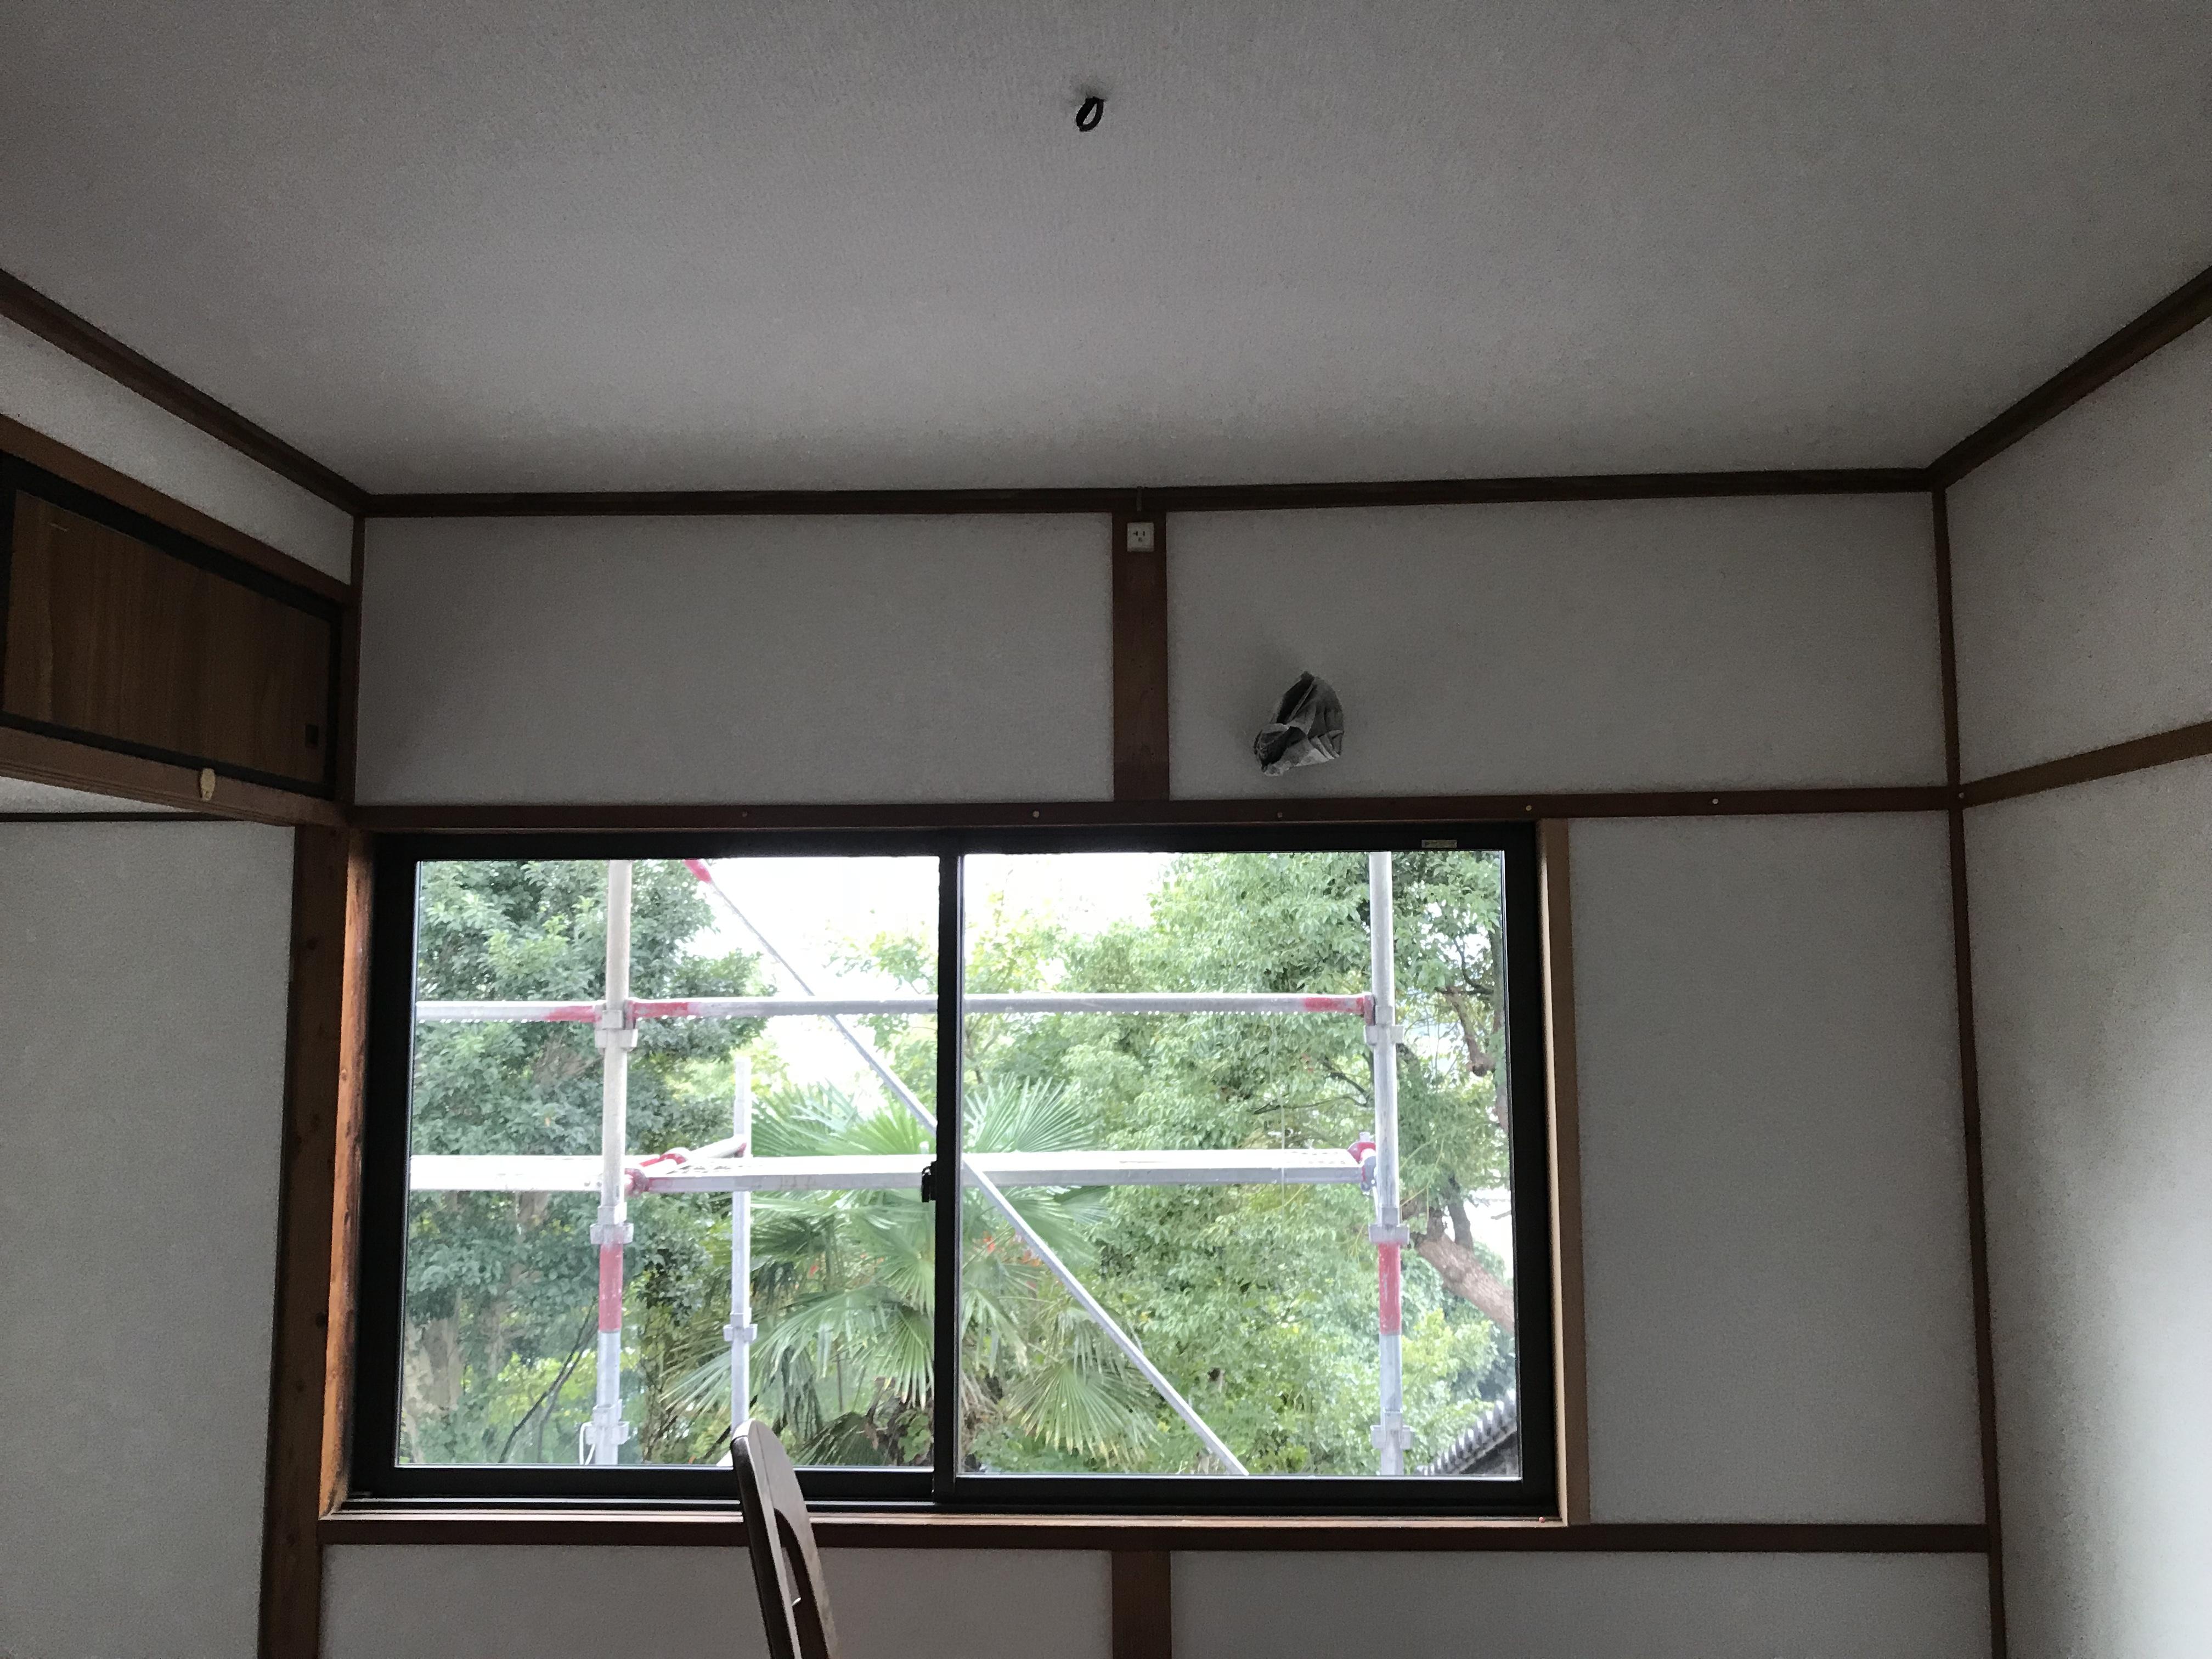 松江 クロス貼替 壁紙貼替